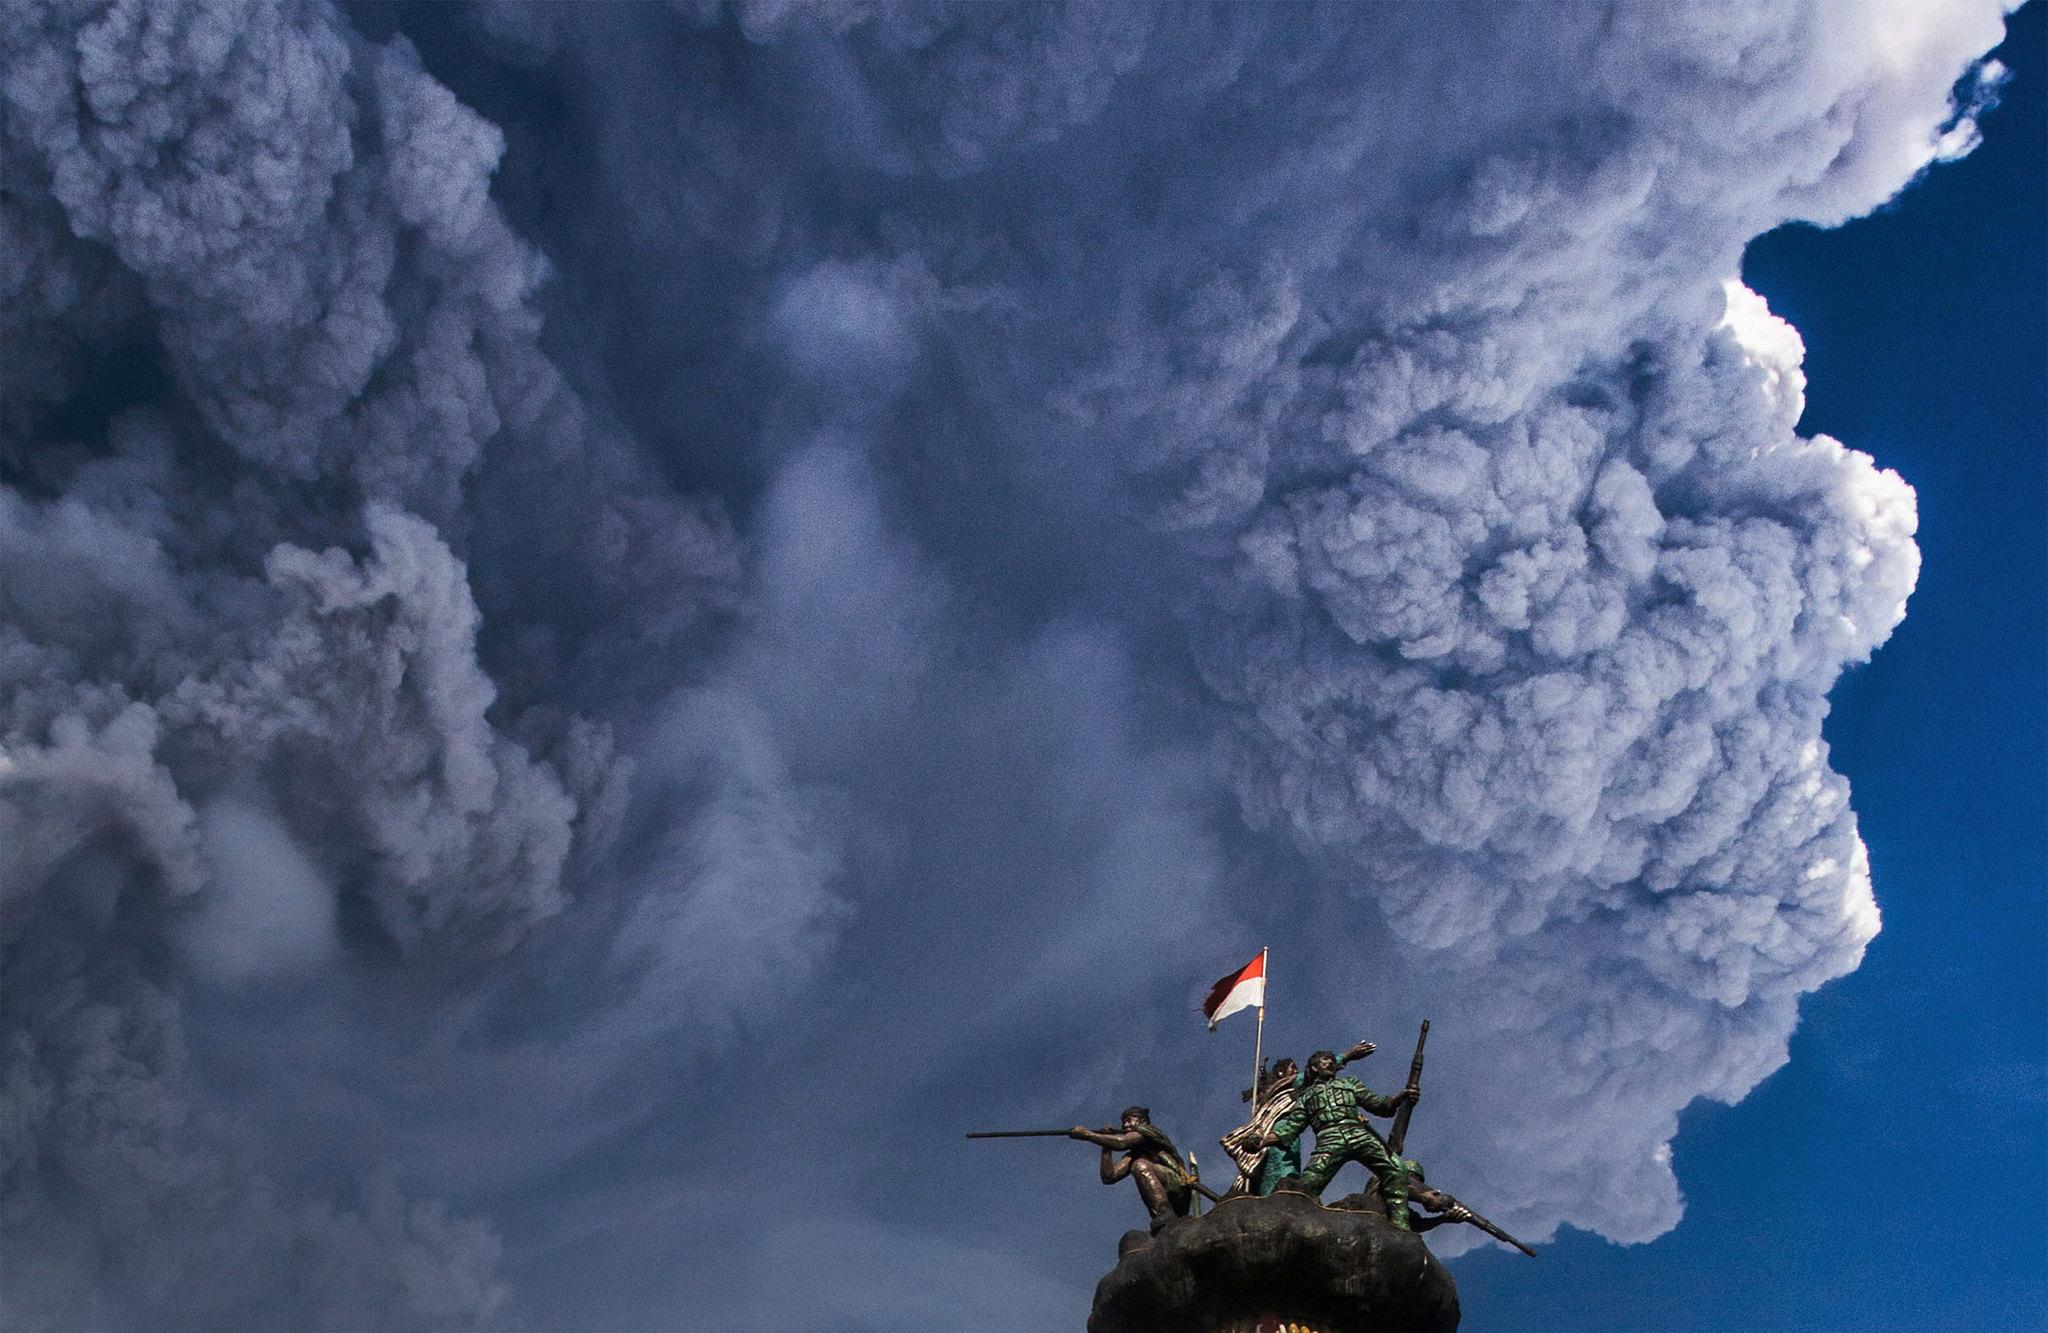 Mount Sinabung Volcano Erupts Again